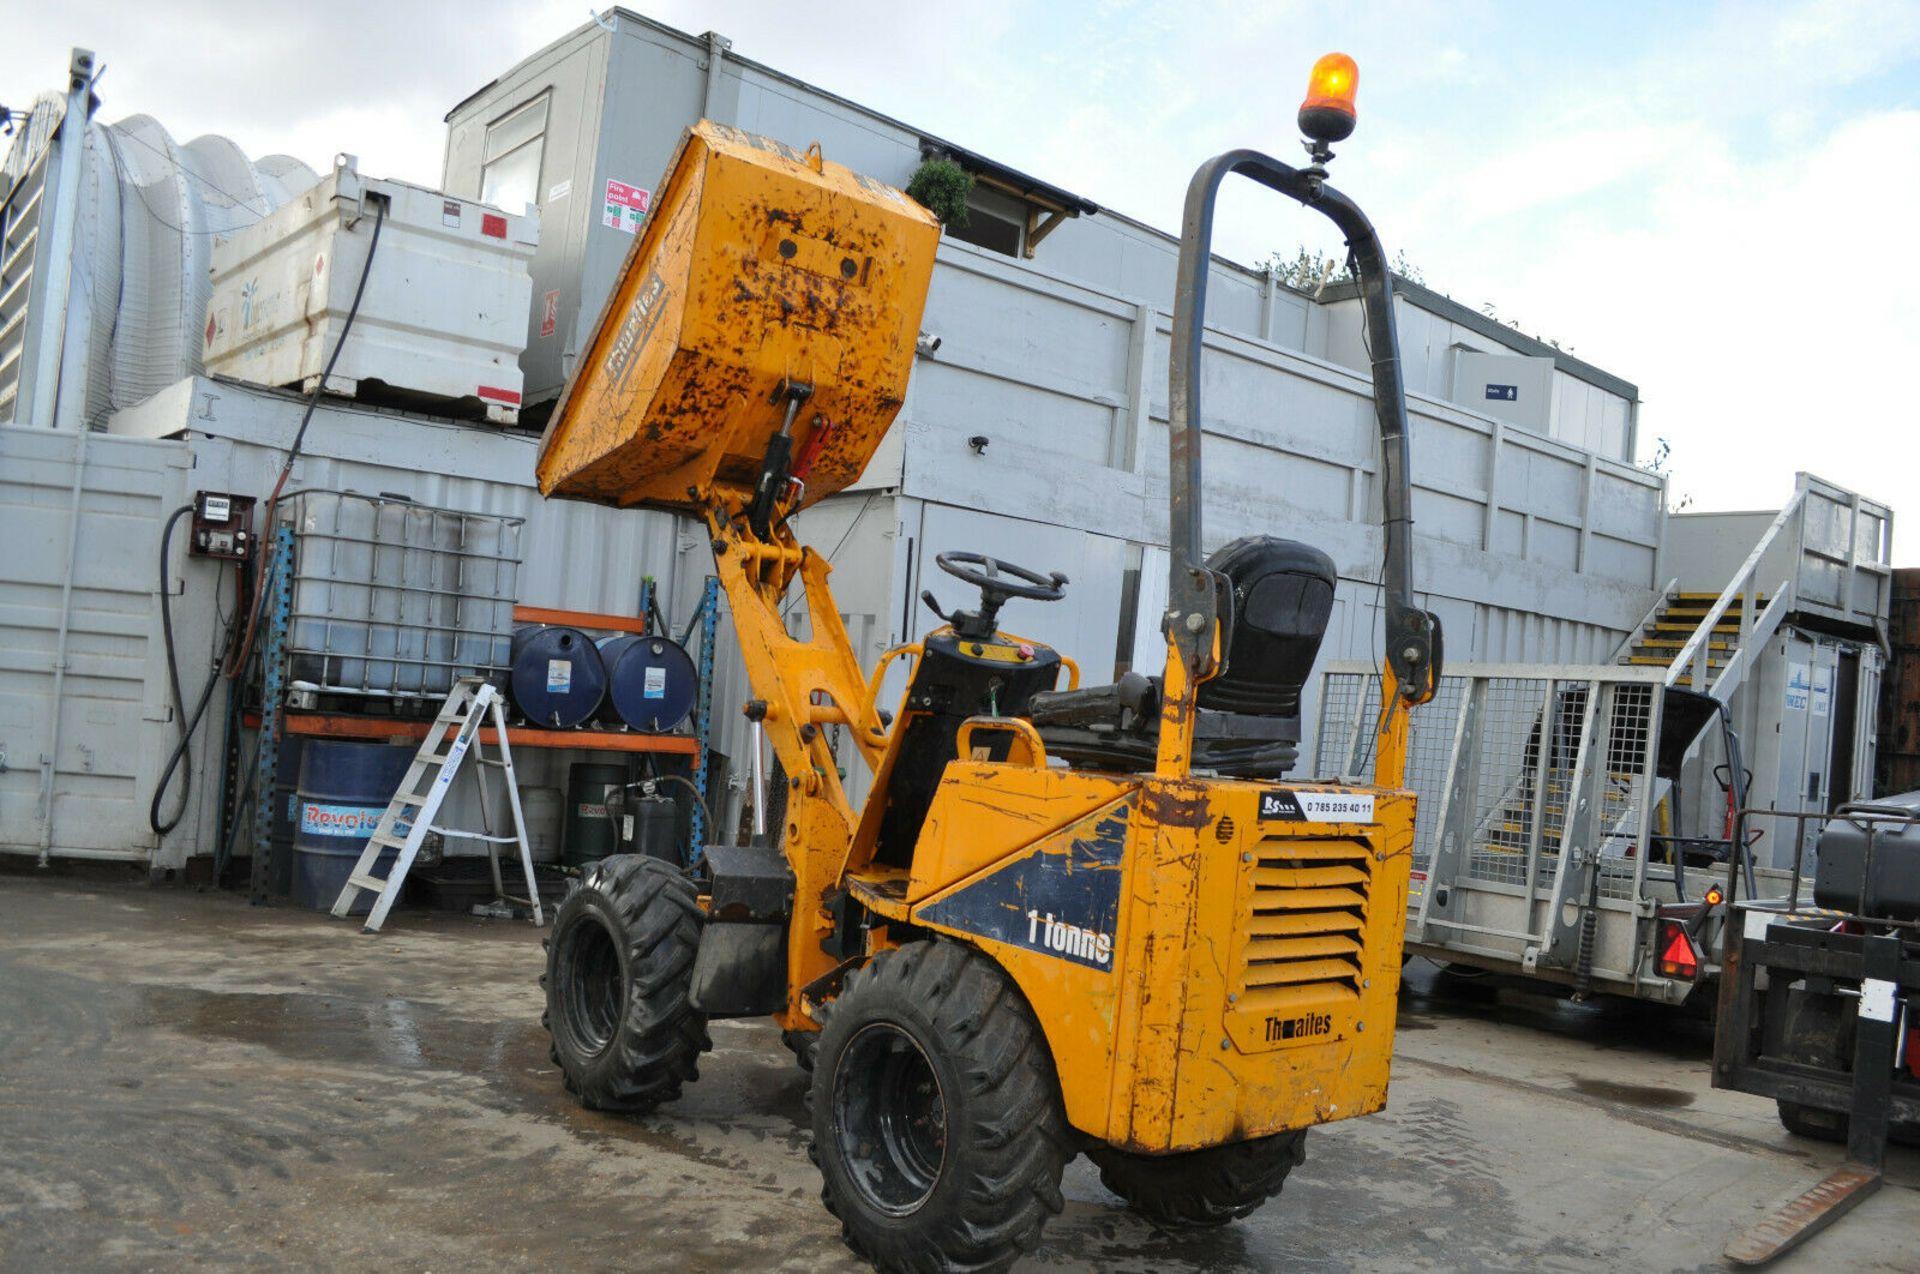 Lot 99 - Thwaites 1 Tonne High Tip Dumper